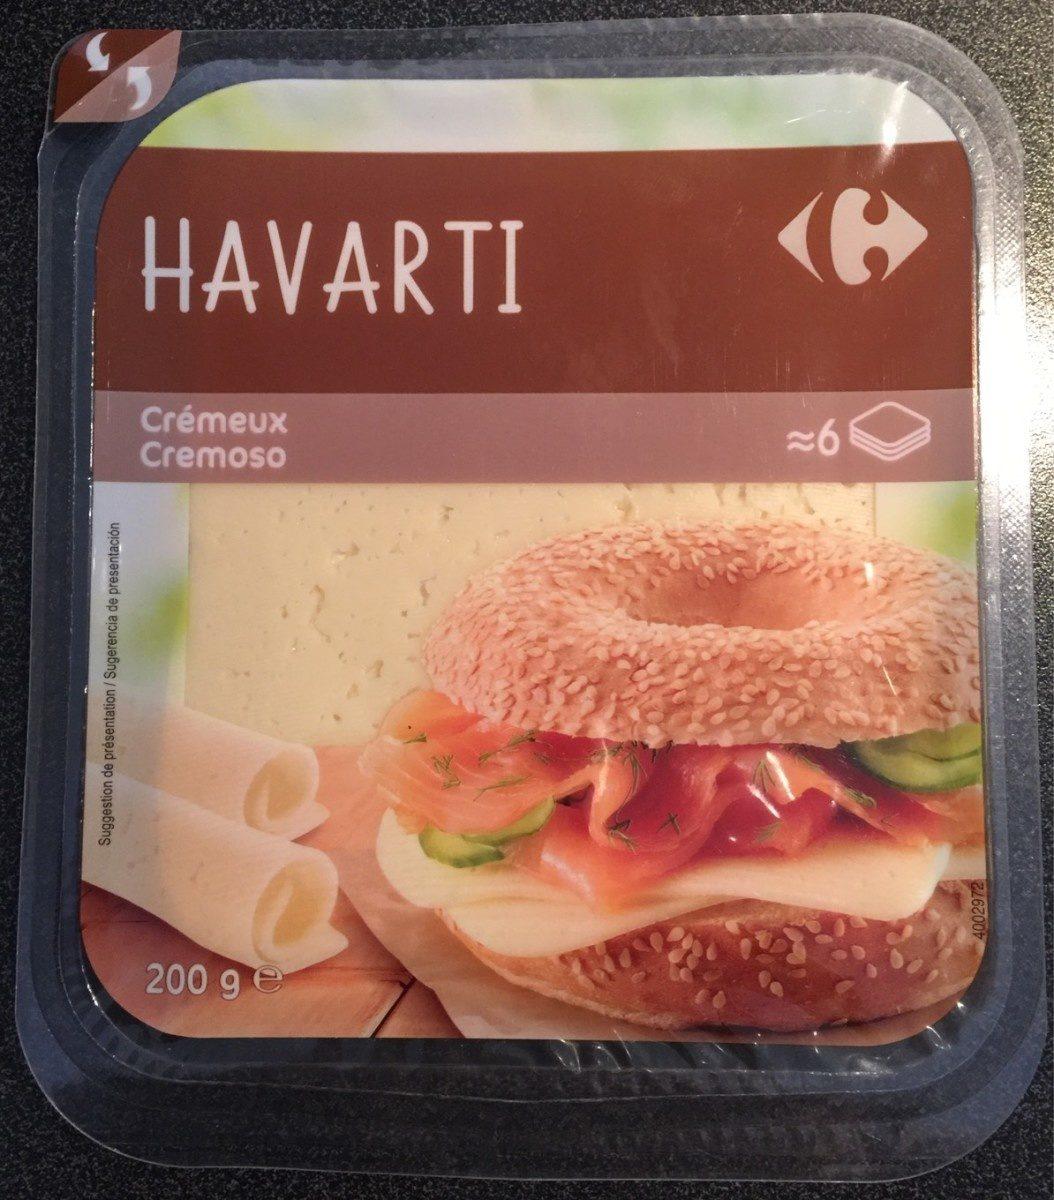 Havarti - Product - fr